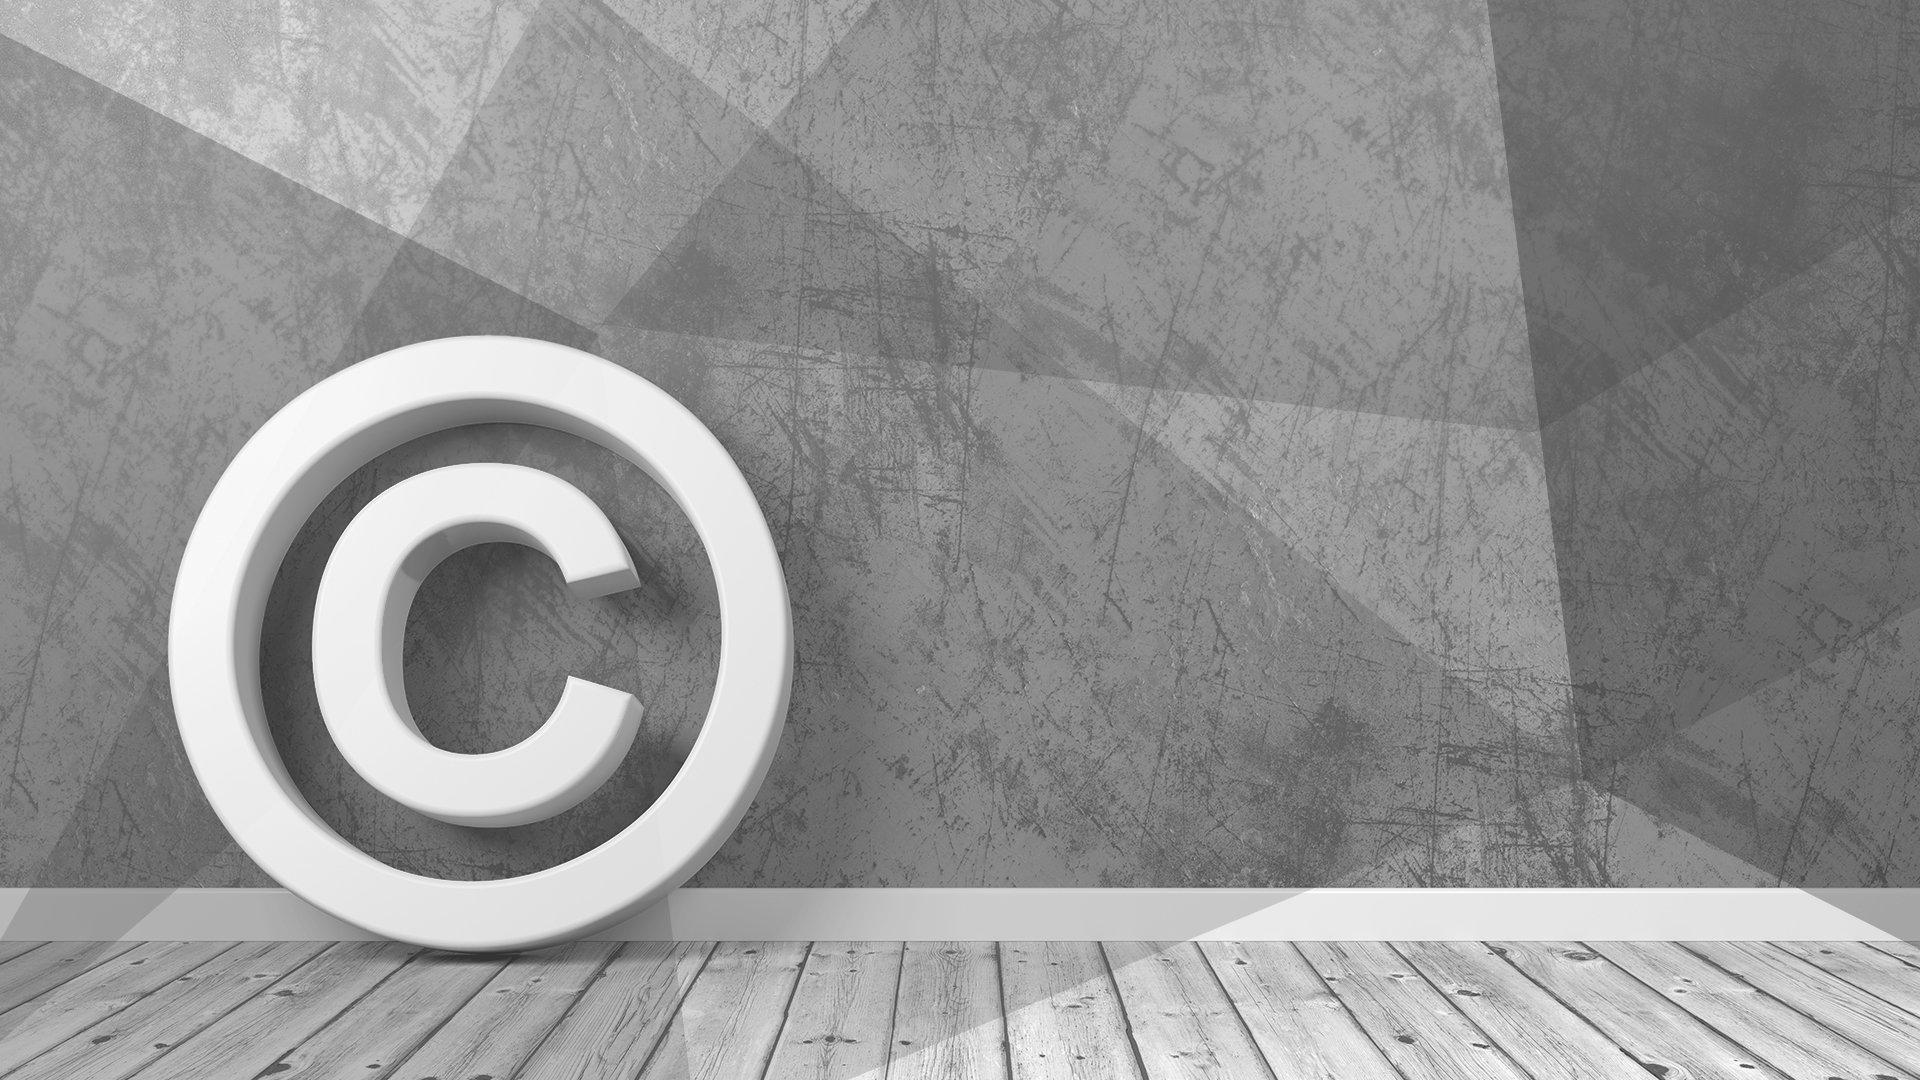 Urheberrecht, Filesharing, Piraterie, Urheberrechtsverletzungen, Copyright, Filesharer, Piracy, Softwarepiraterie